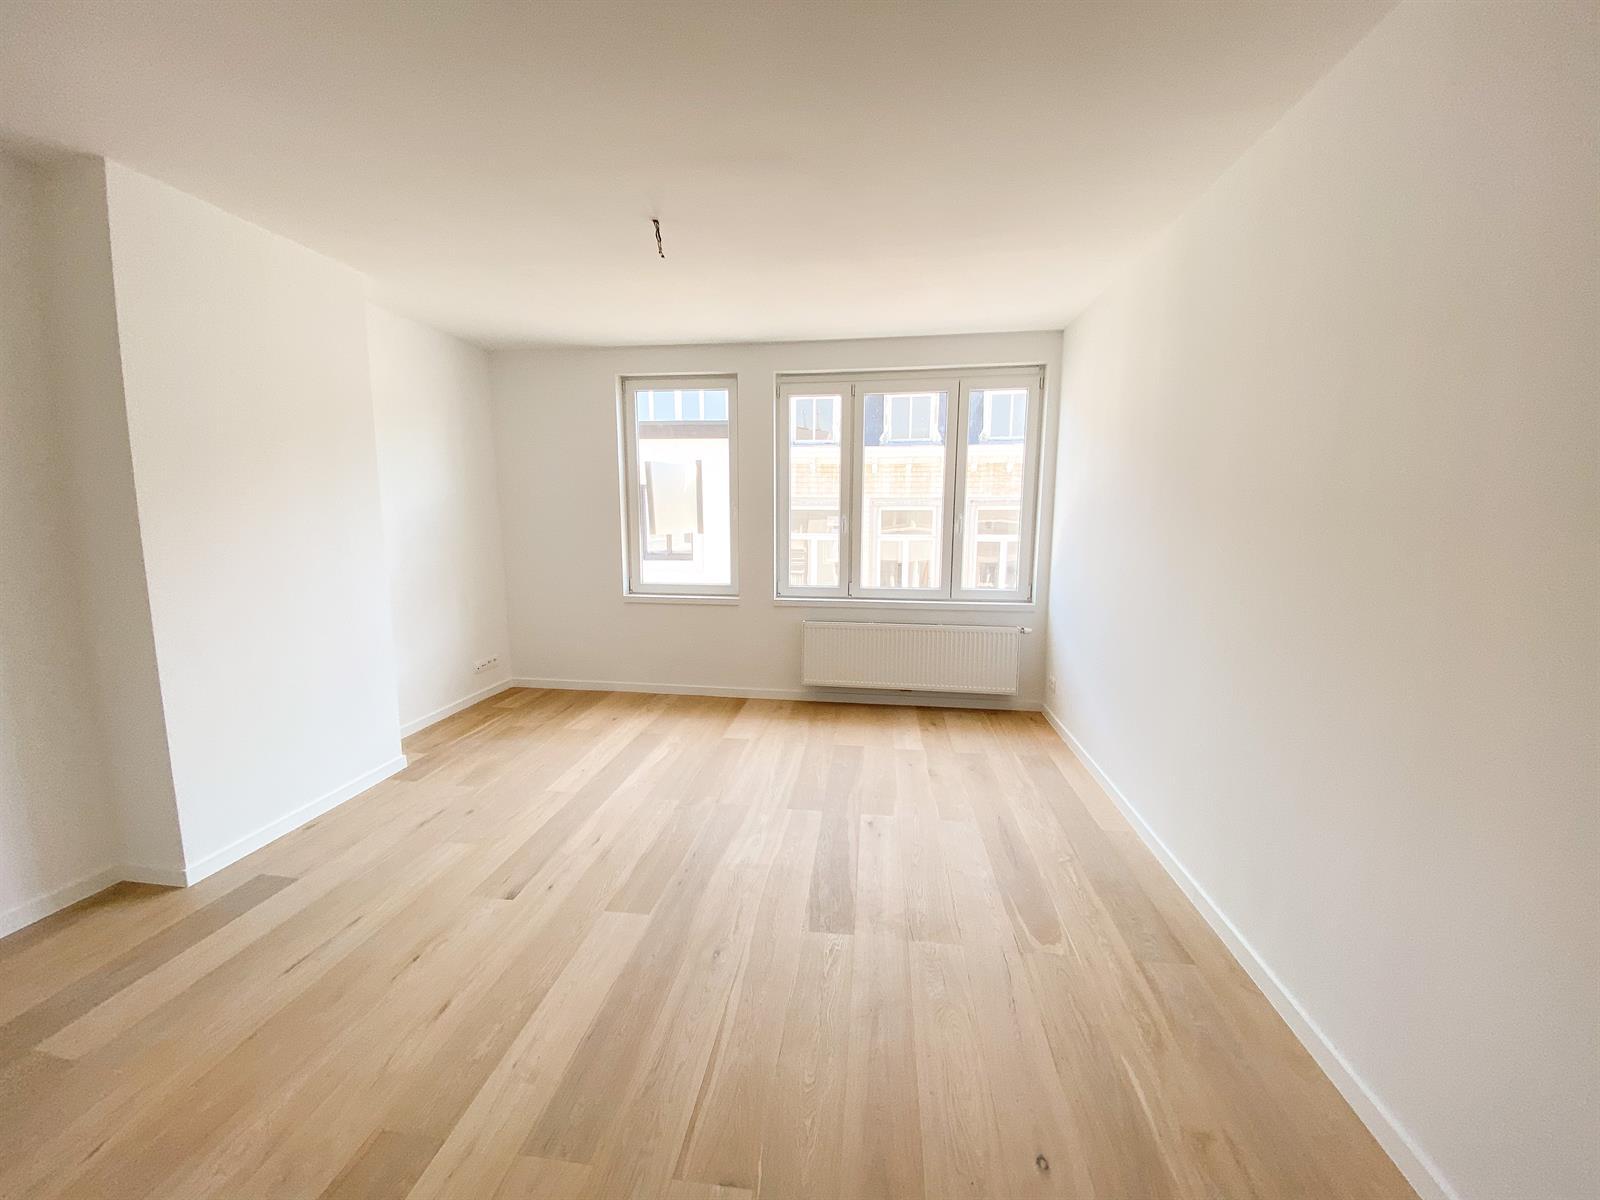 Appartement - Liège - #4045828-4